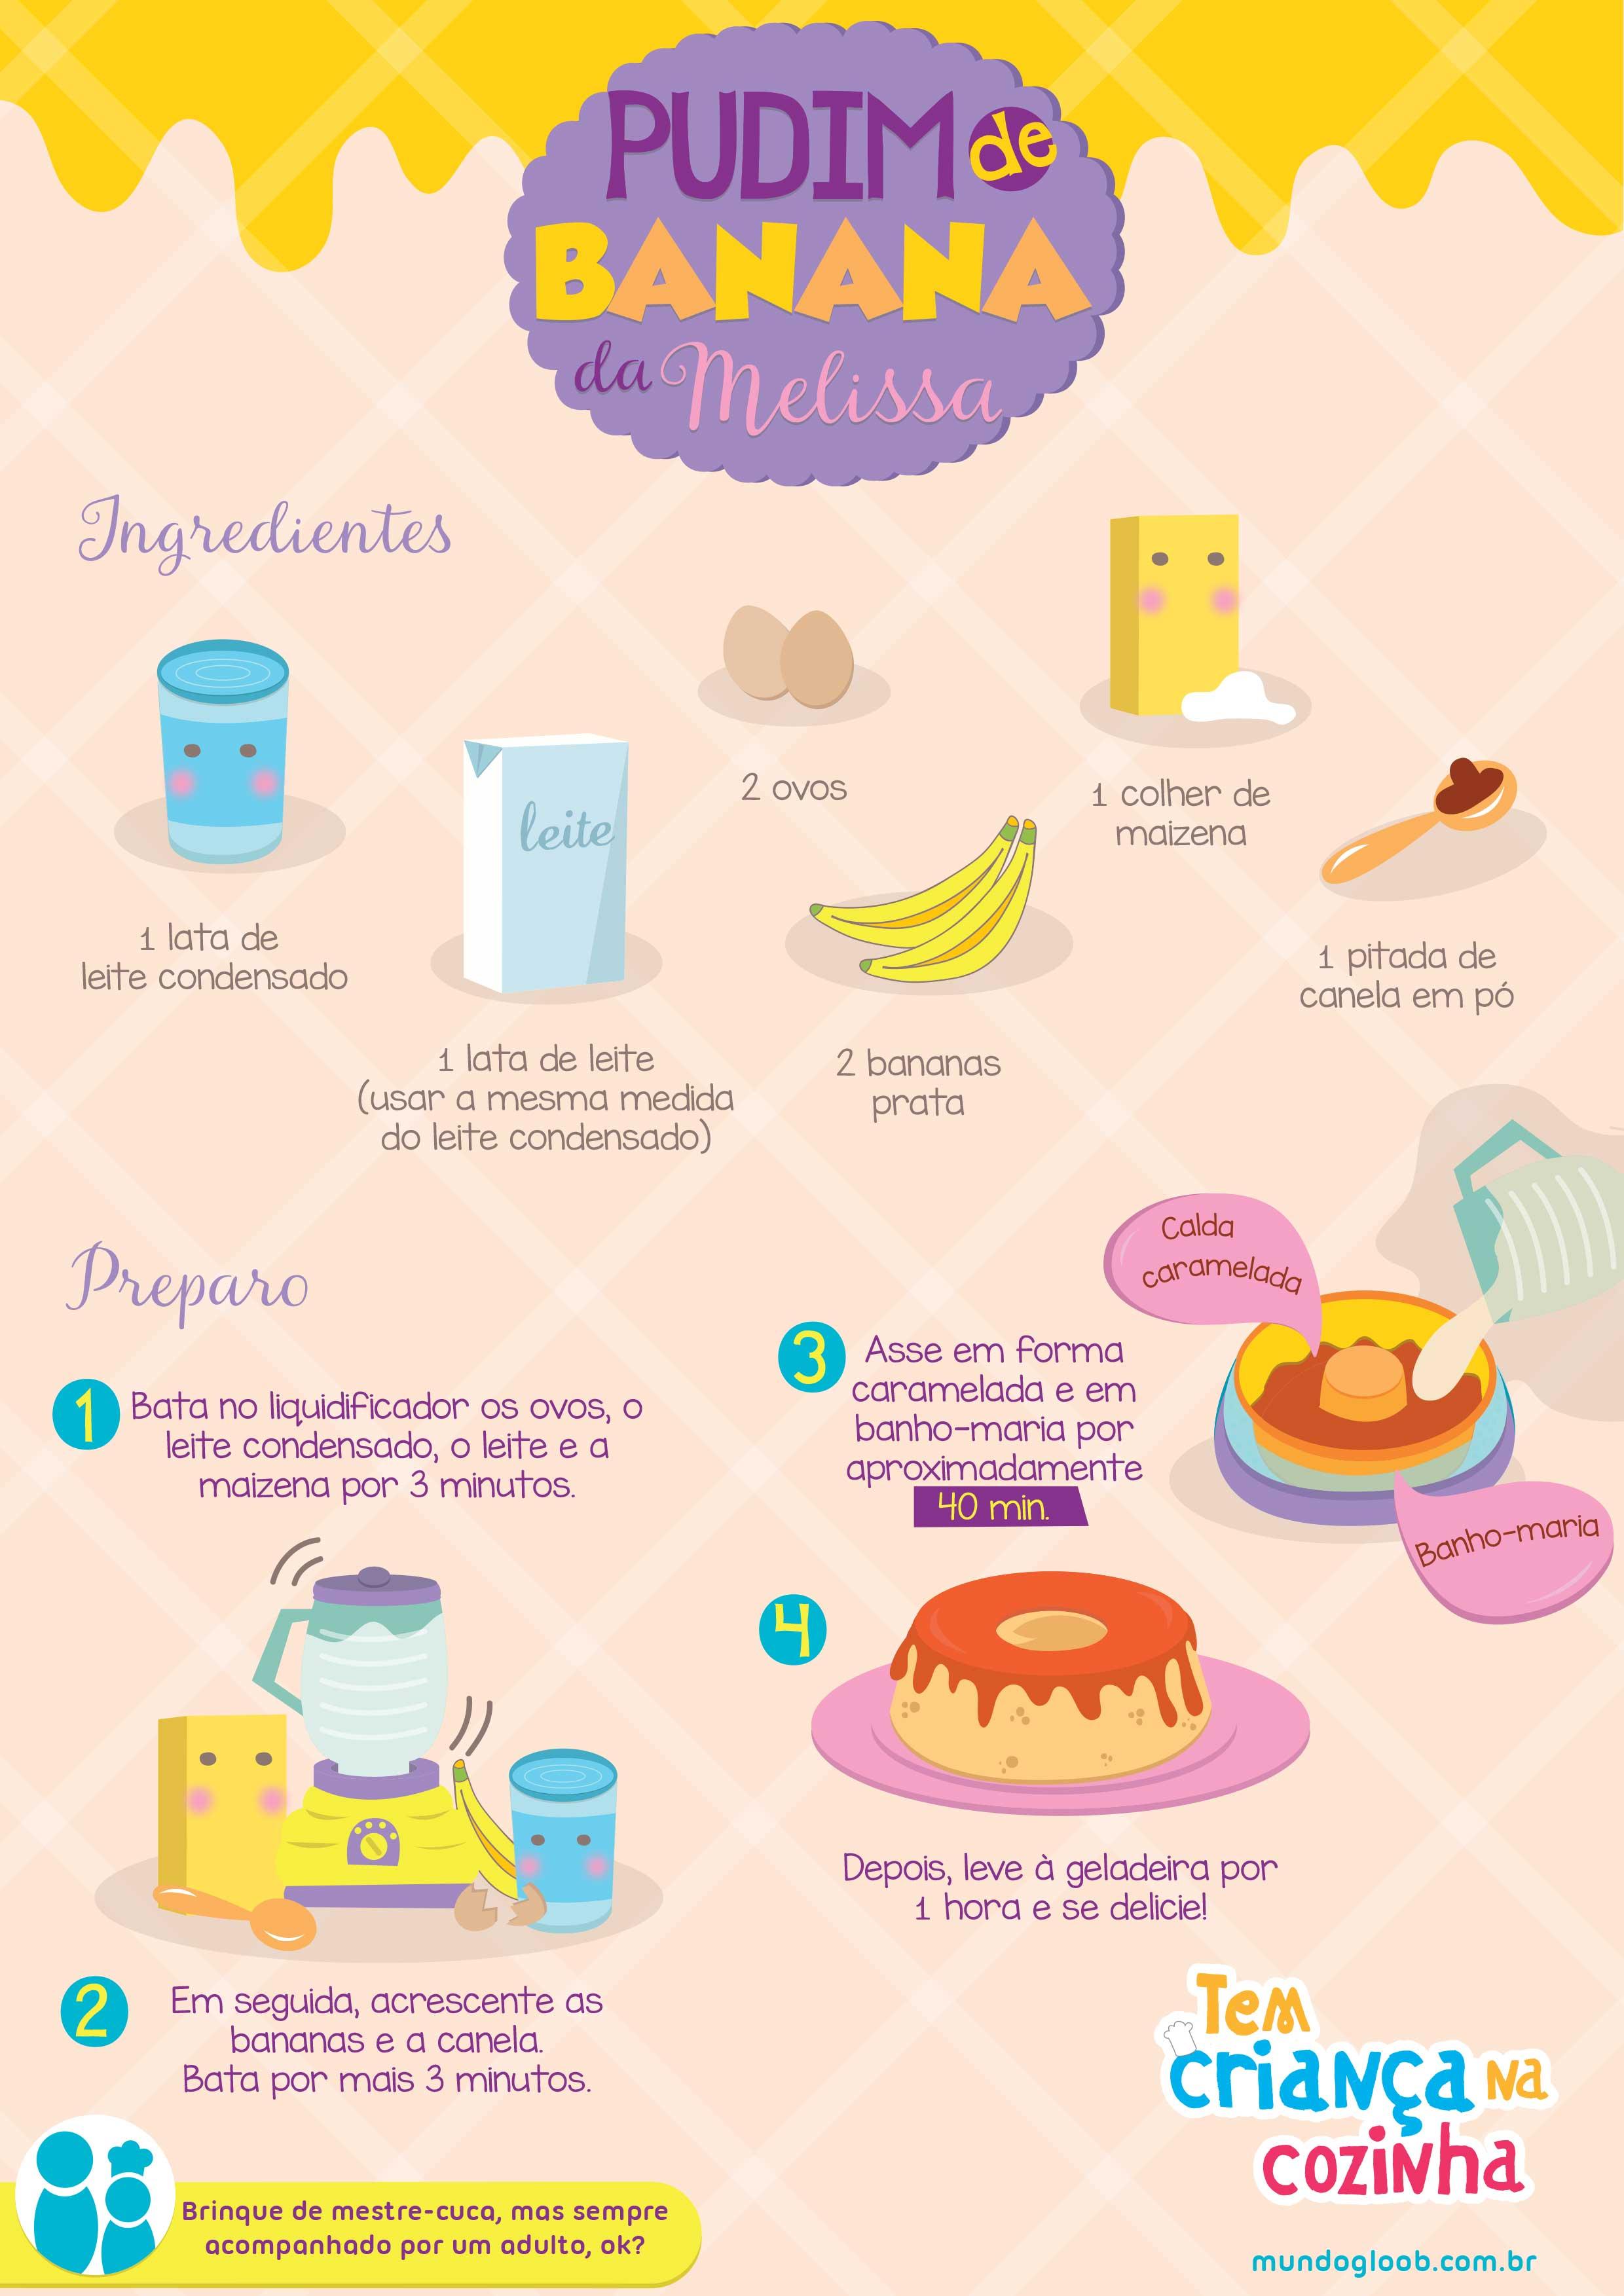 Pudim de Banana da Melissa